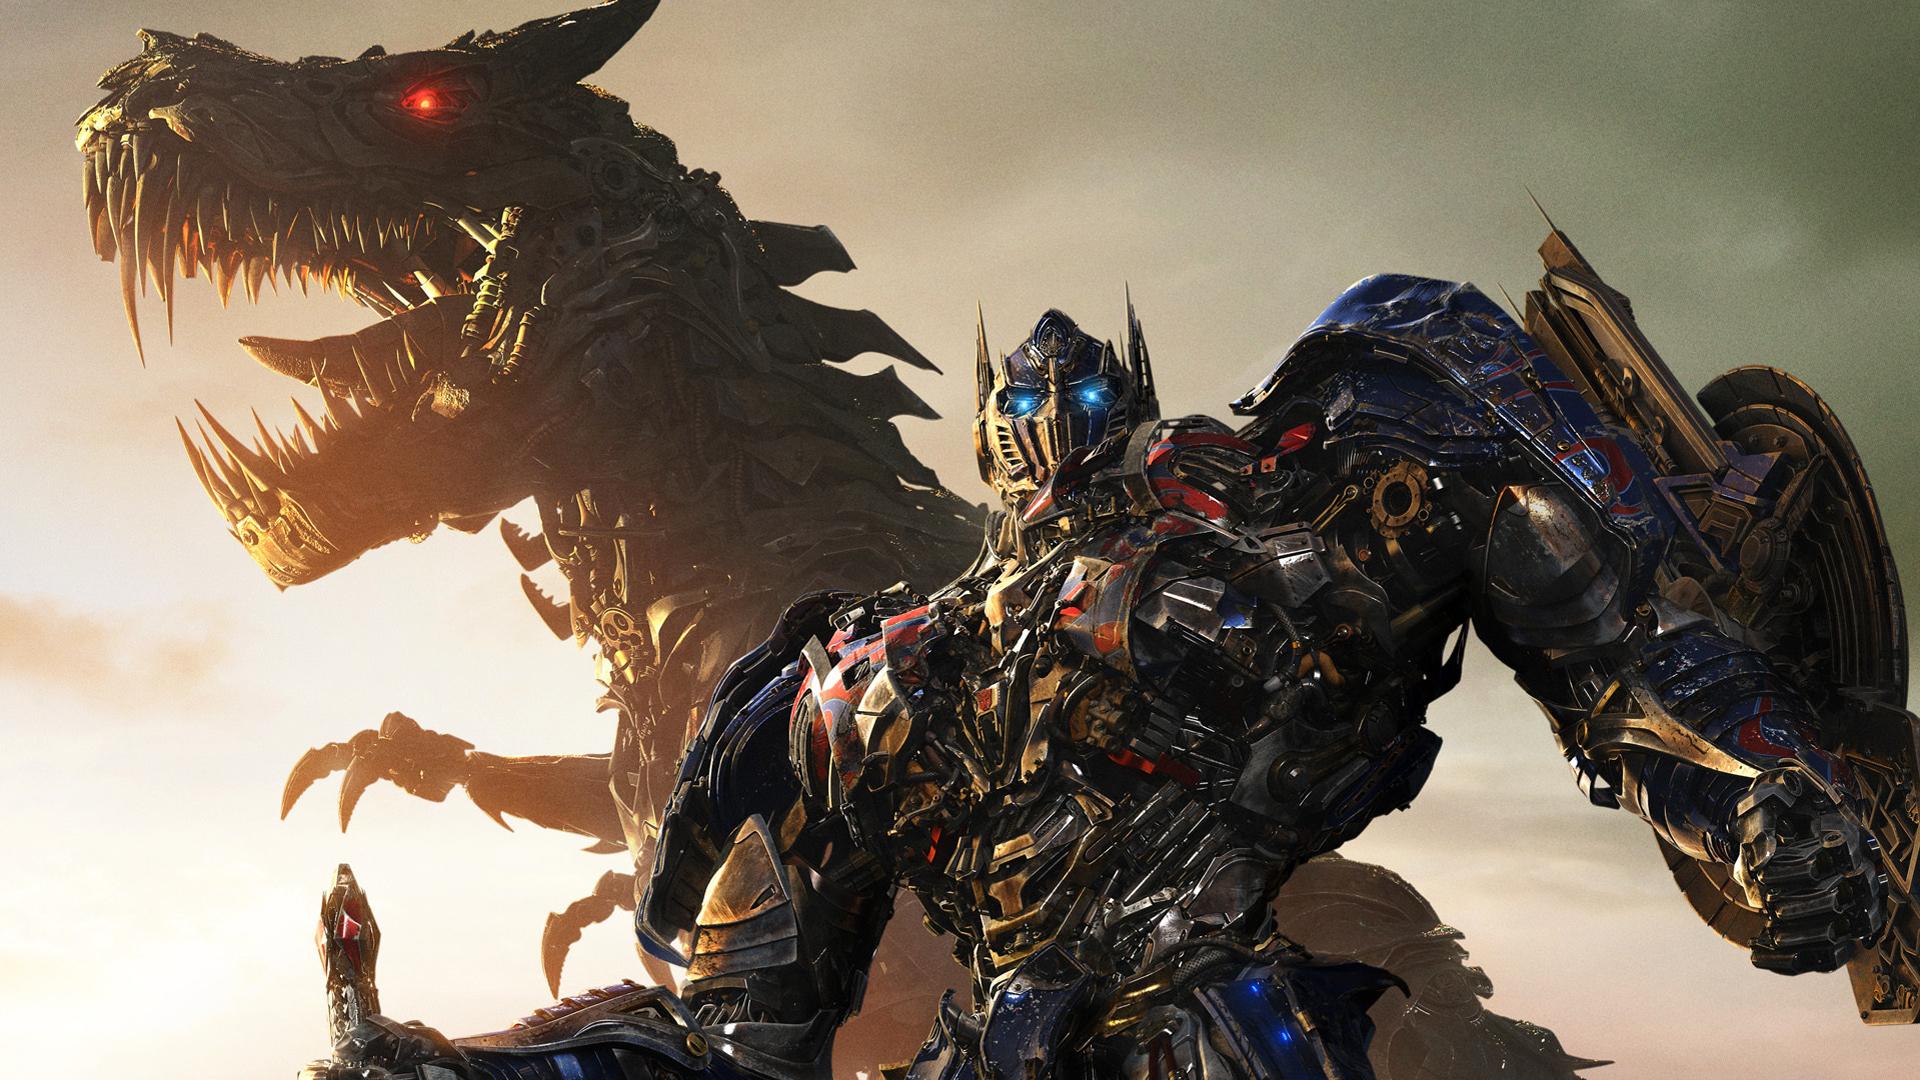 ... grimlock and autobot optimus prime transformers age of extinction